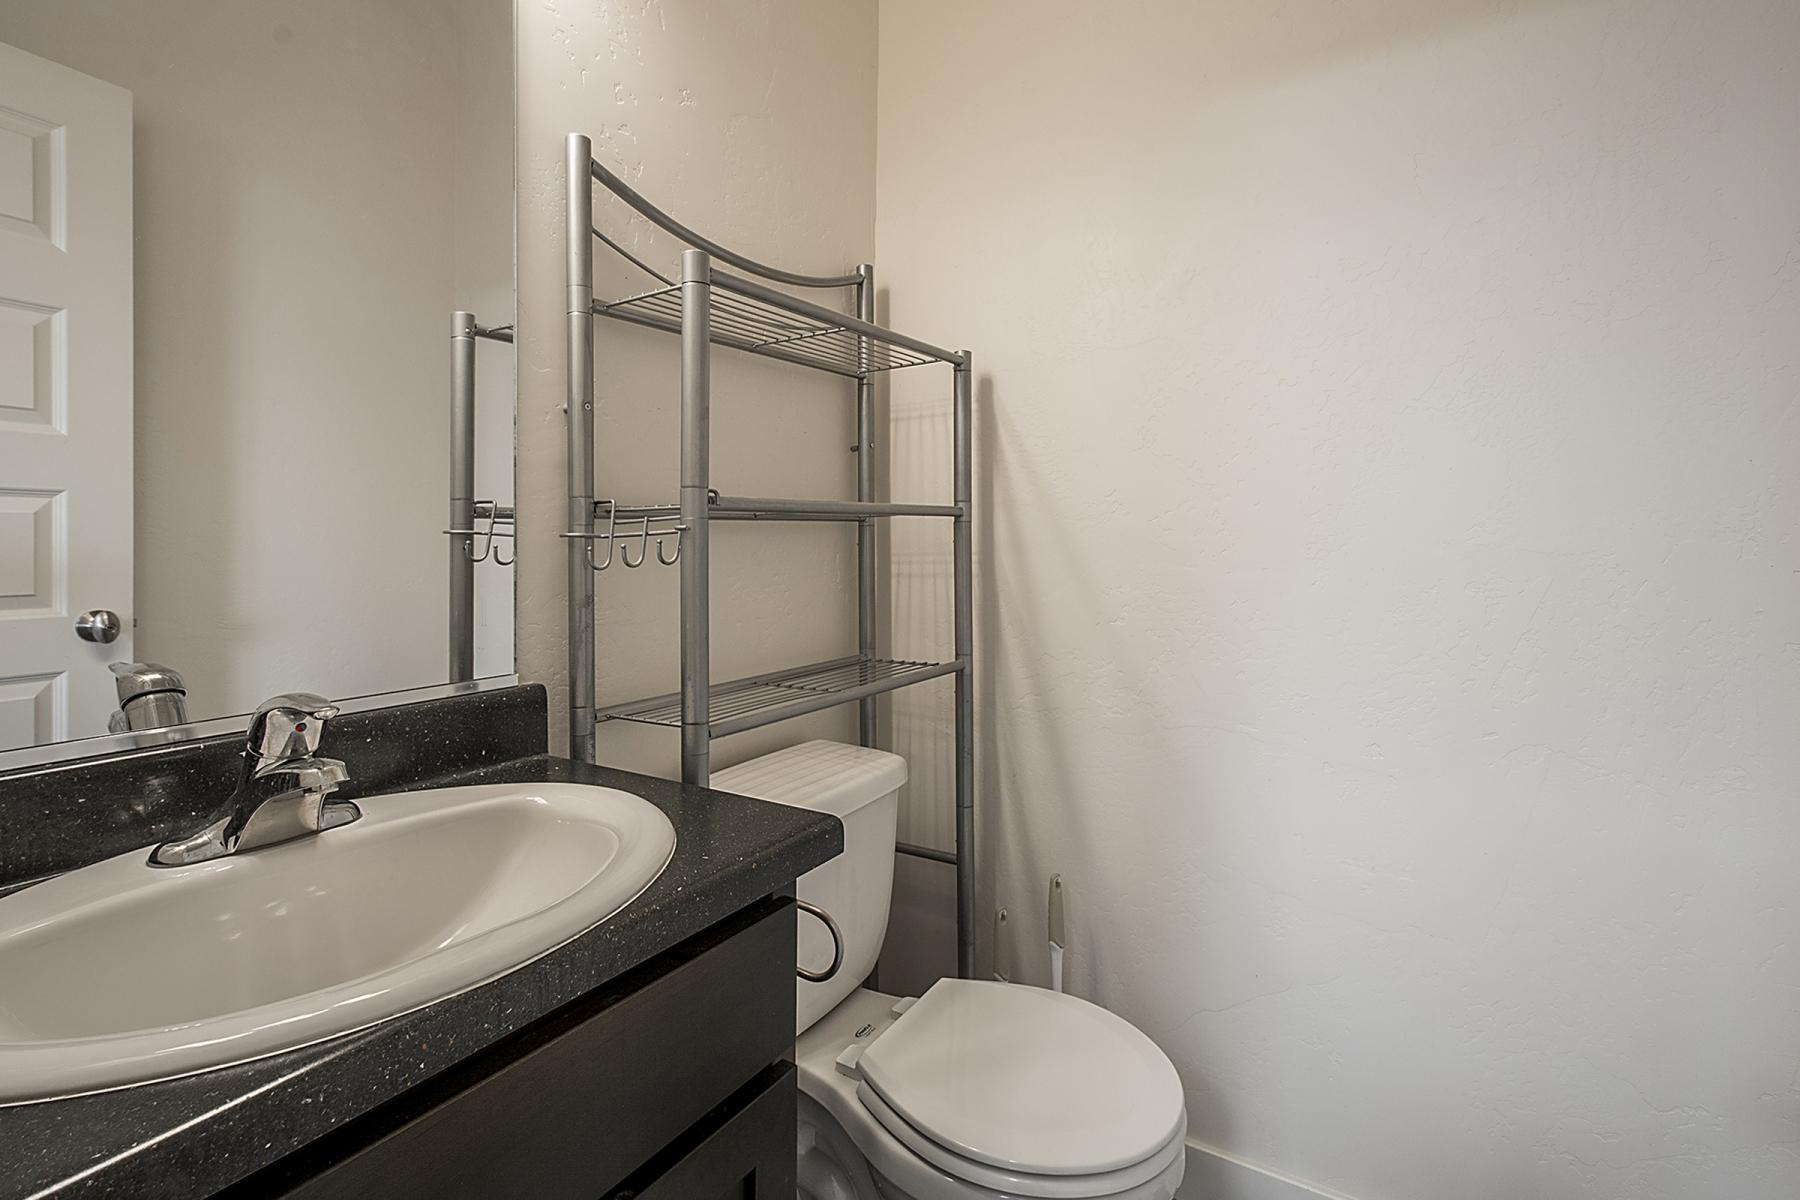 BathroomOne_1800x1200_2515434